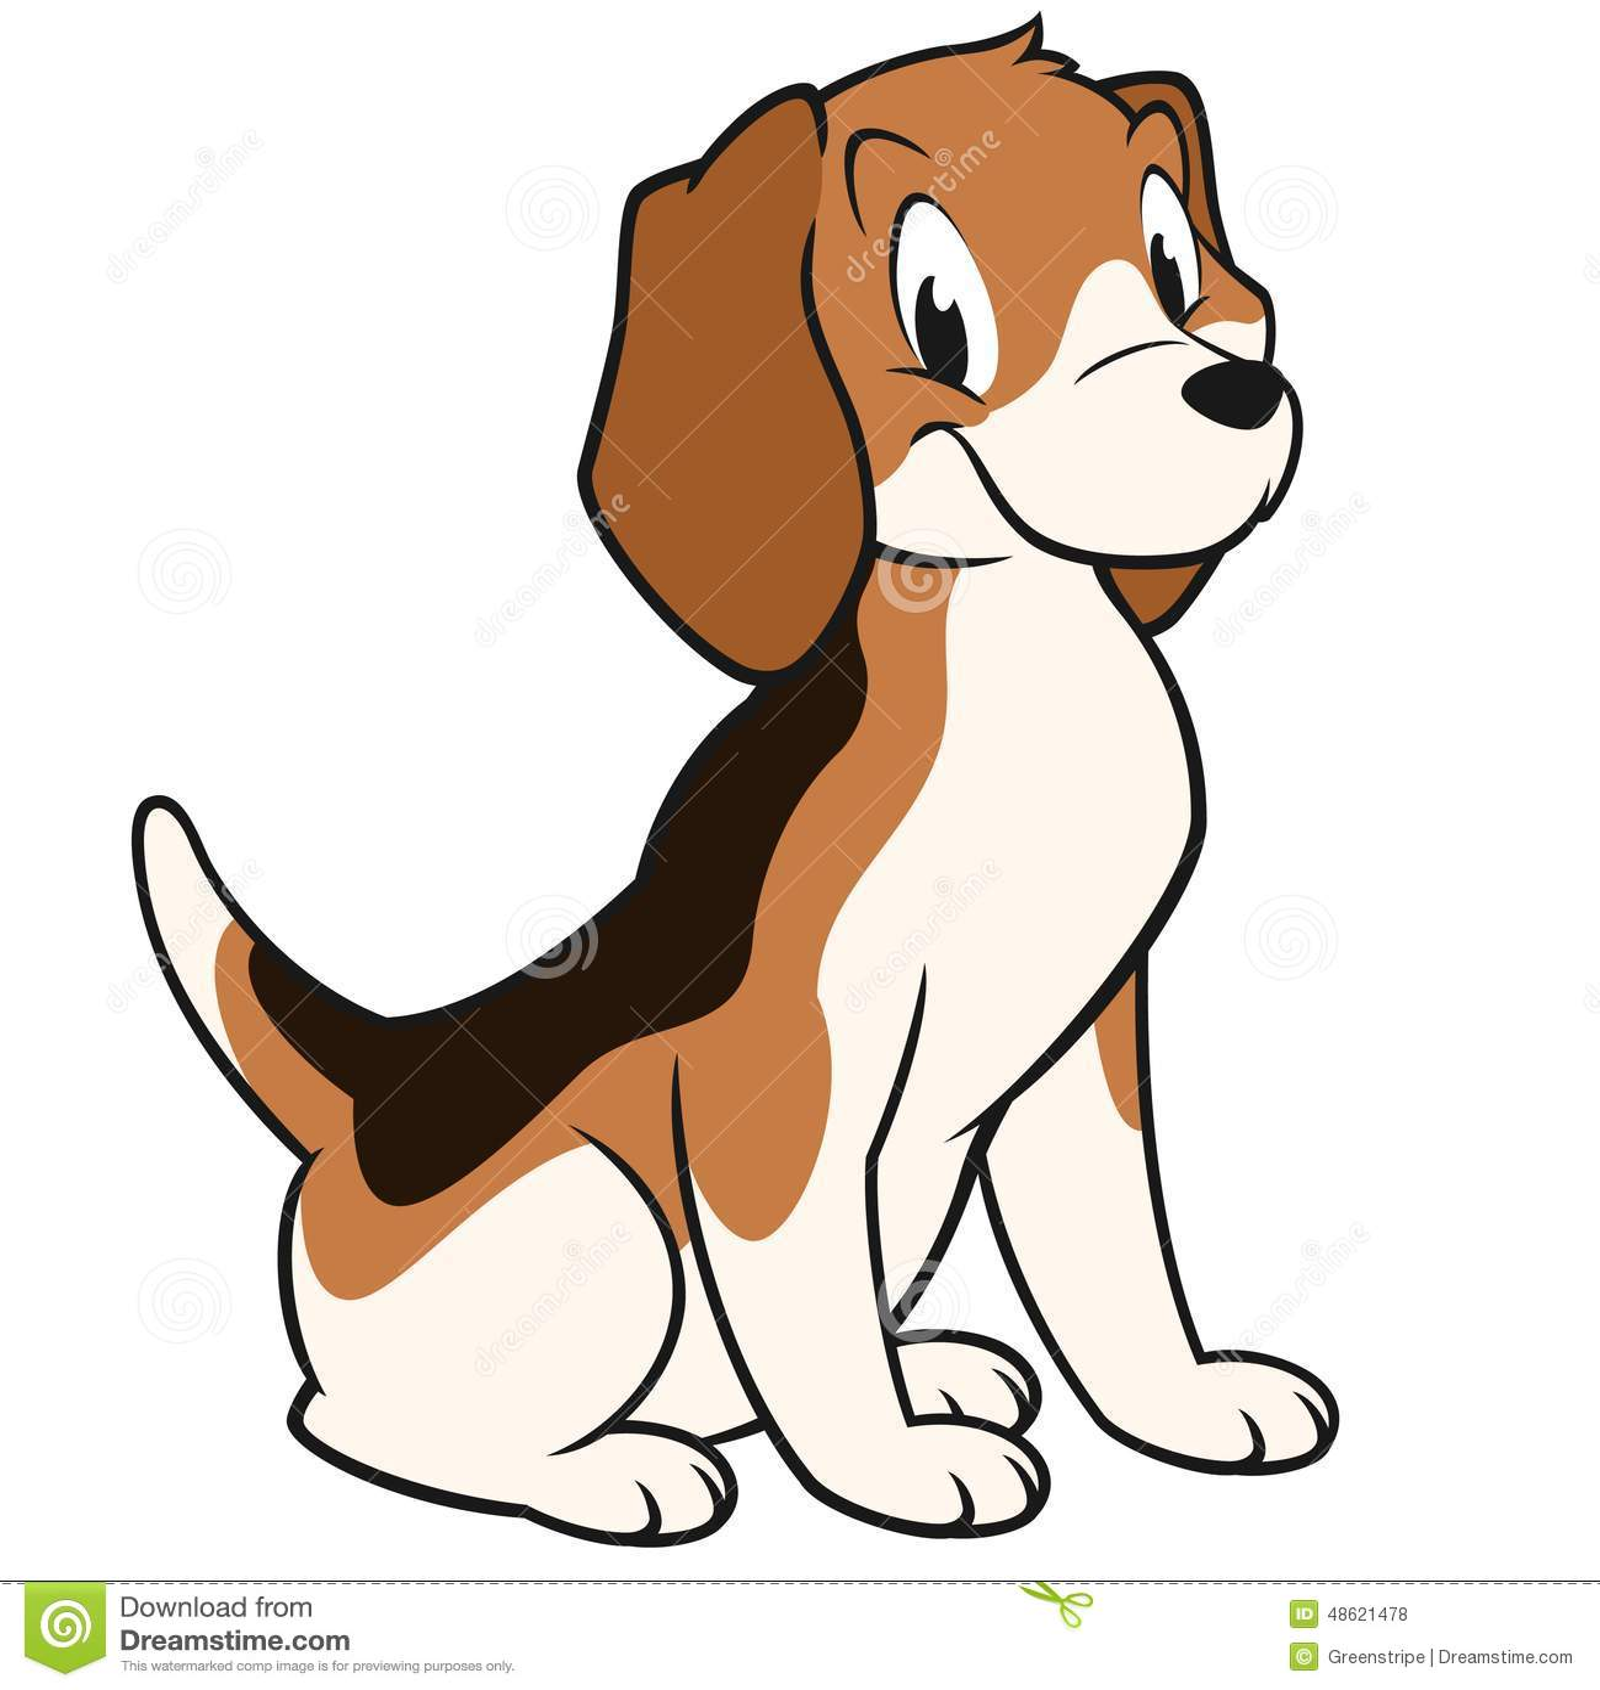 Cartoon Beagle Stock Vector - Image: 48621478